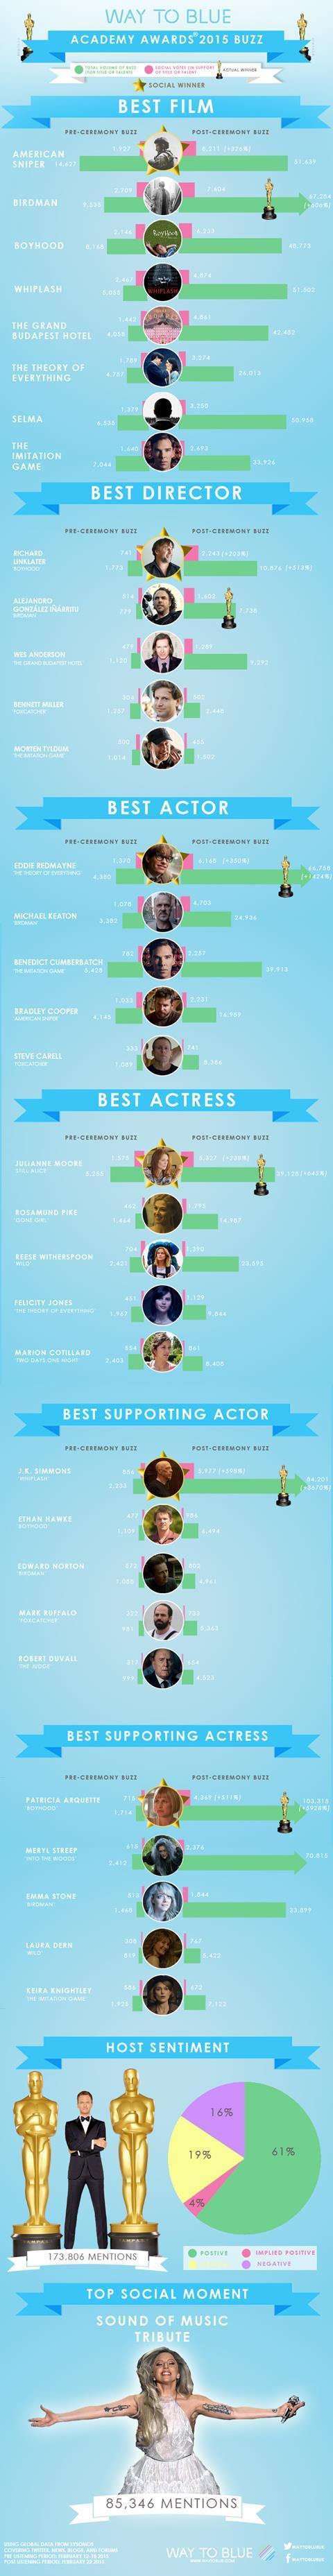 Oscars 2015 social buzz